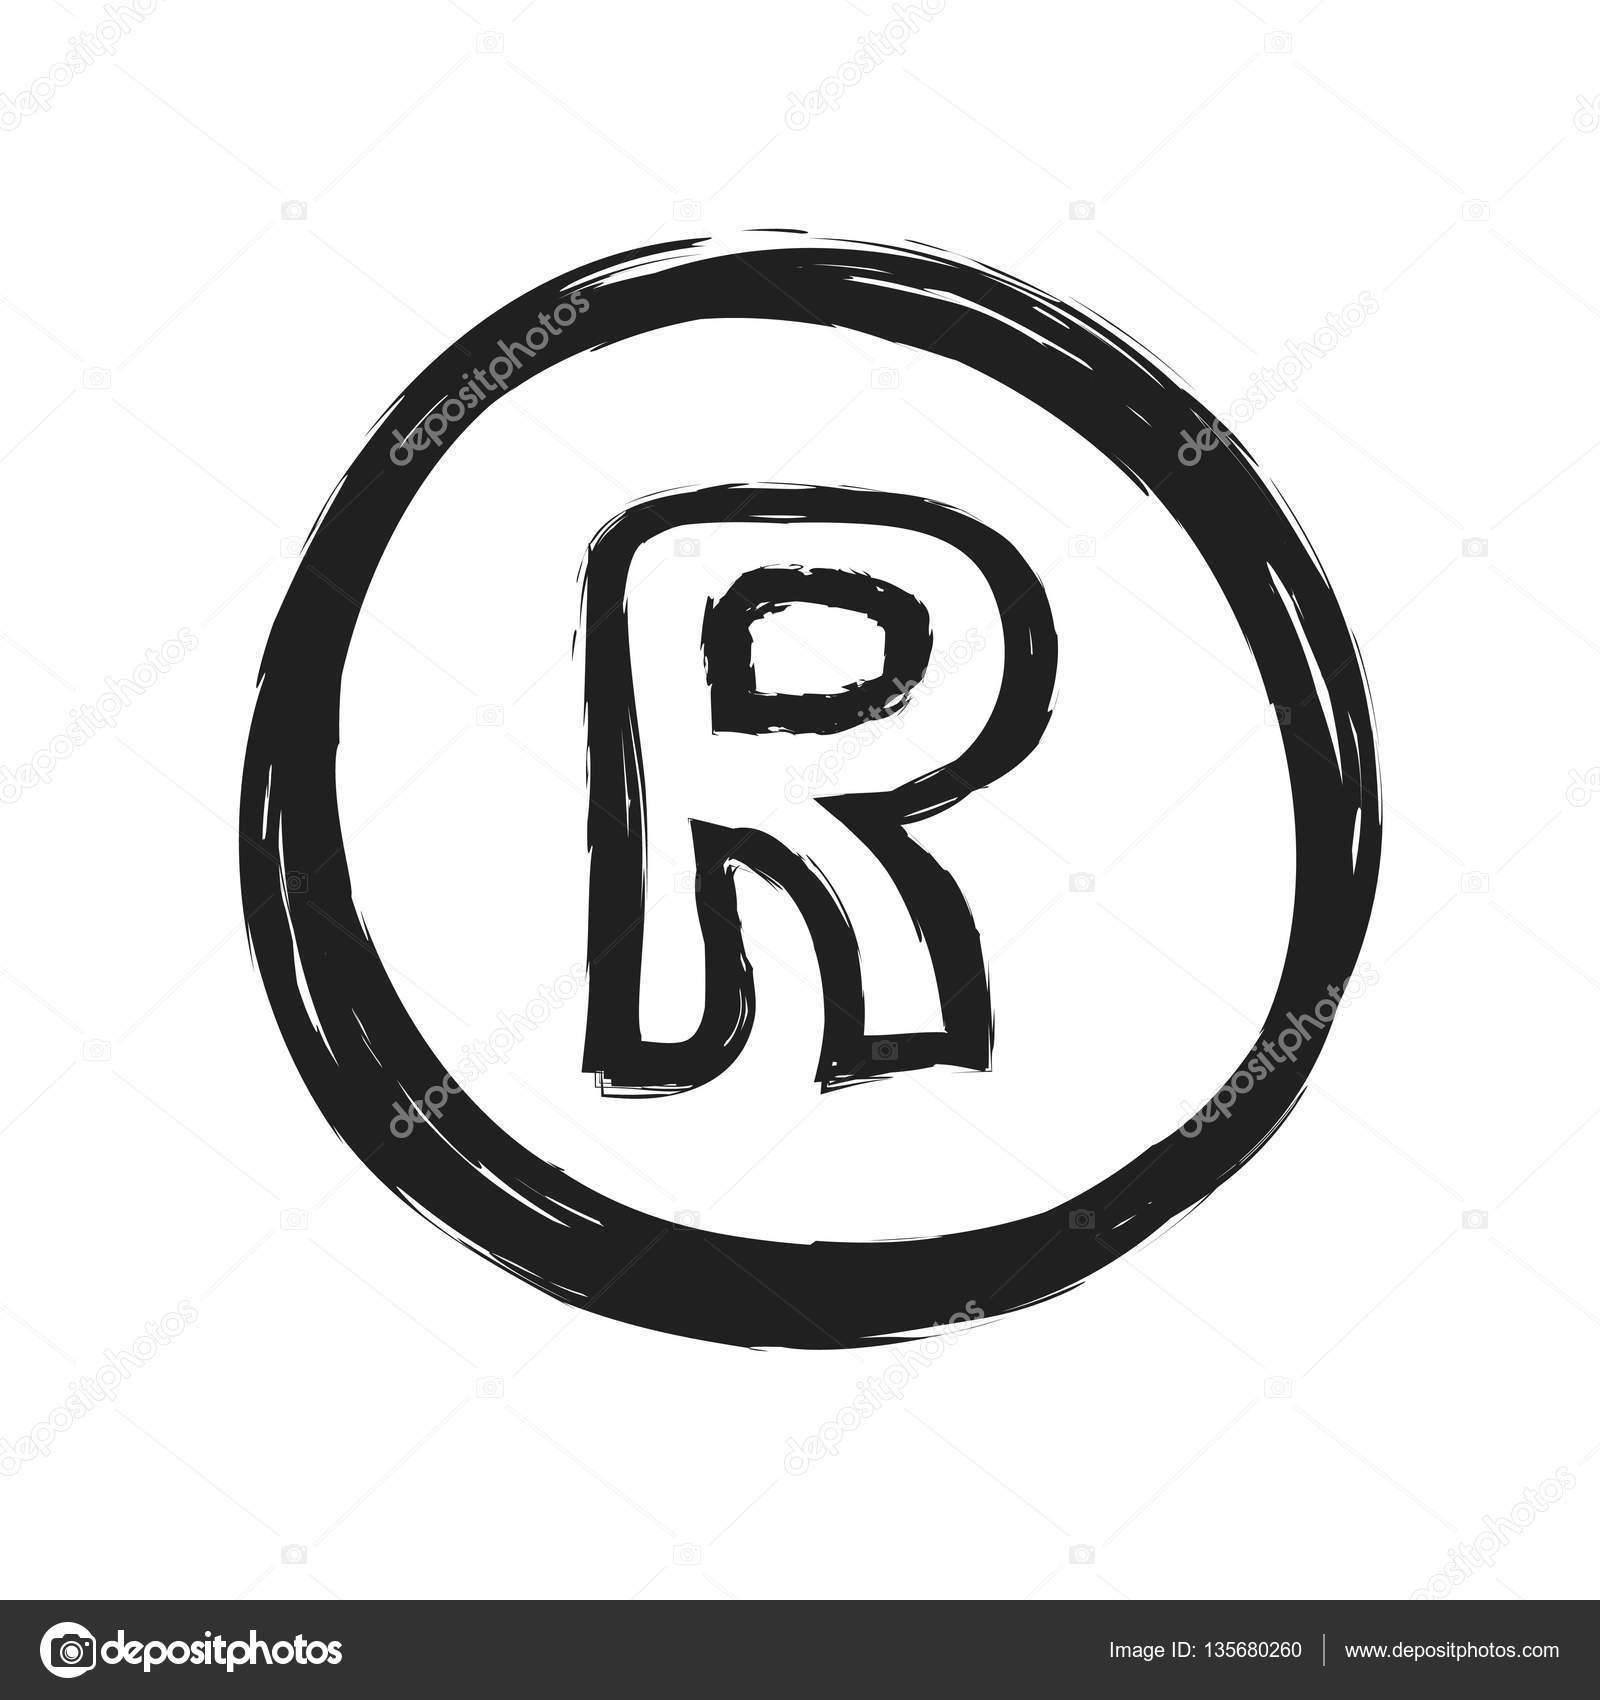 Grunge registered trademark symbol illustration stock photo grunge registered trademark symbol illustration stock photo biocorpaavc Gallery